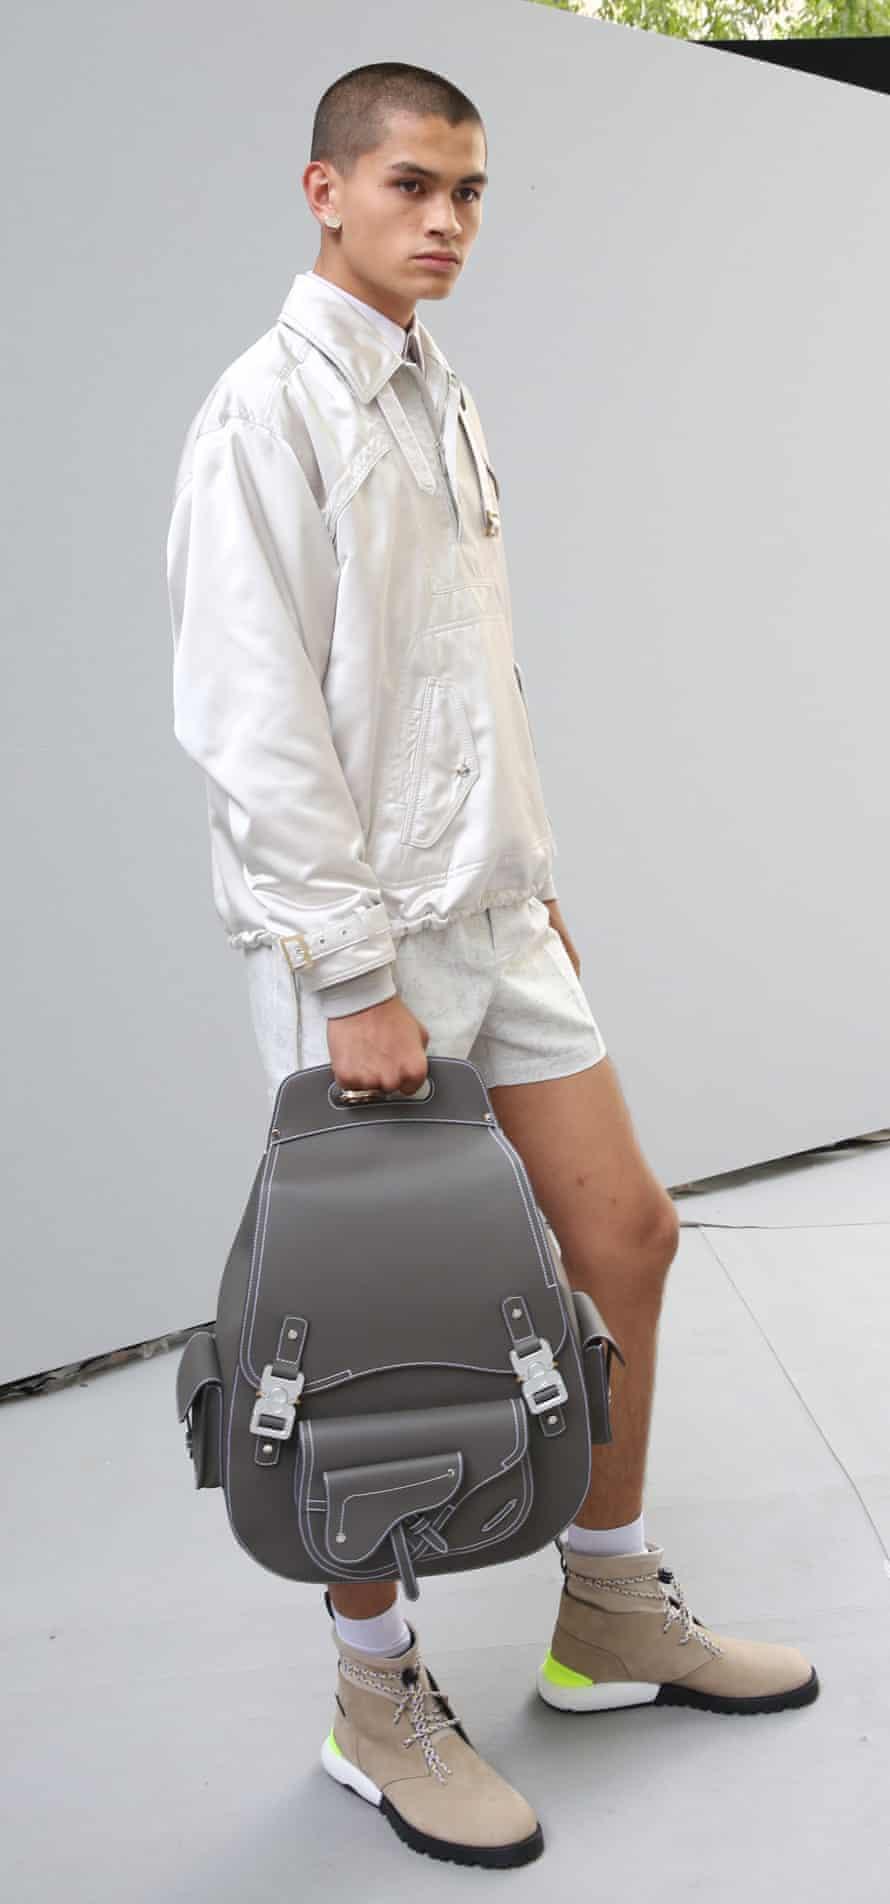 Dior Homme show, Backstage, Spring Summer 2019, Paris Fashion Week Men's, France - 23 Jun 2018Mandatory Credit: Photo by WWD/REX/Shutterstock (9721748e) Model backstage Dior Homme show, Backstage, Spring Summer 2019, Paris Fashion Week Men's, France - 23 Jun 2018